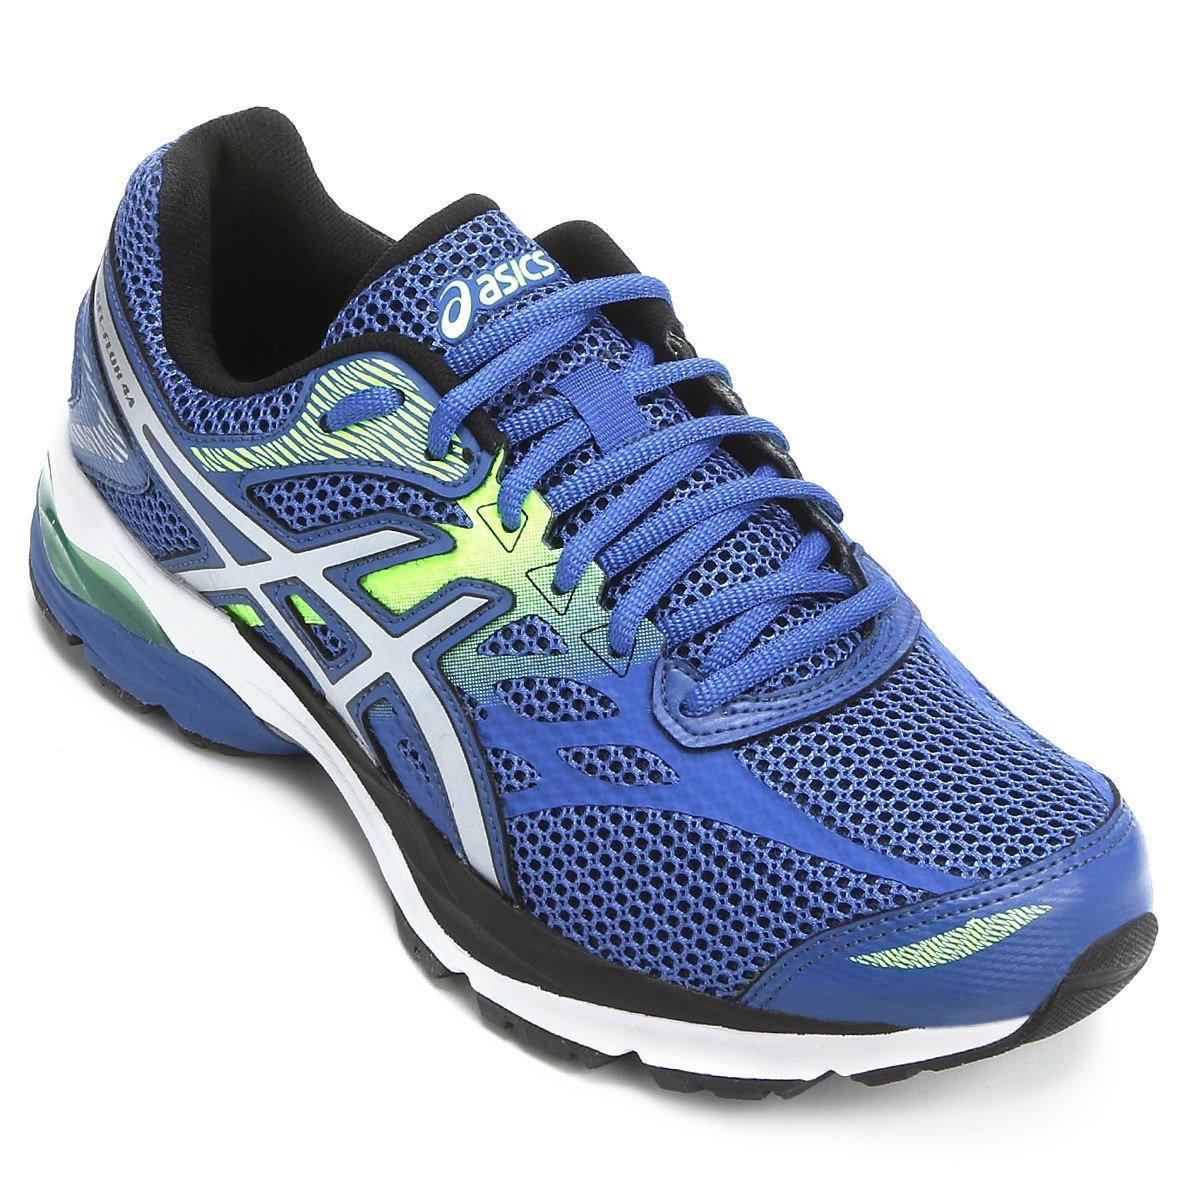 15988d357f6 Tênis Asics FLUX 4 T024AFLUX4 Asics - Azul - Girardi Running Store